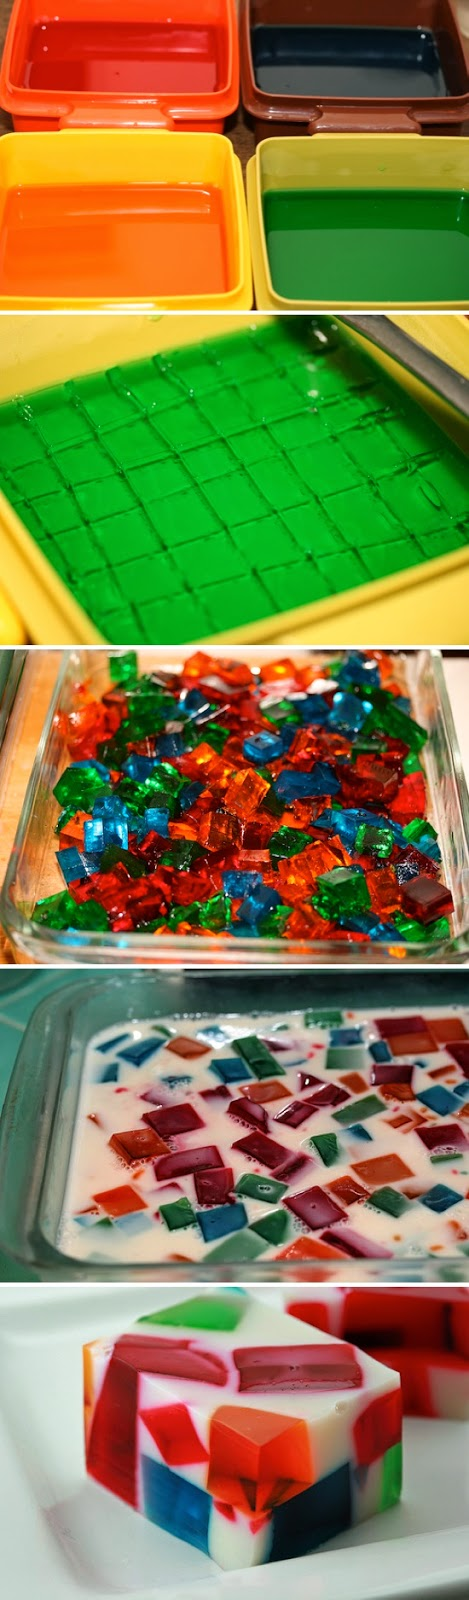 How To Make Broken Glass Jello